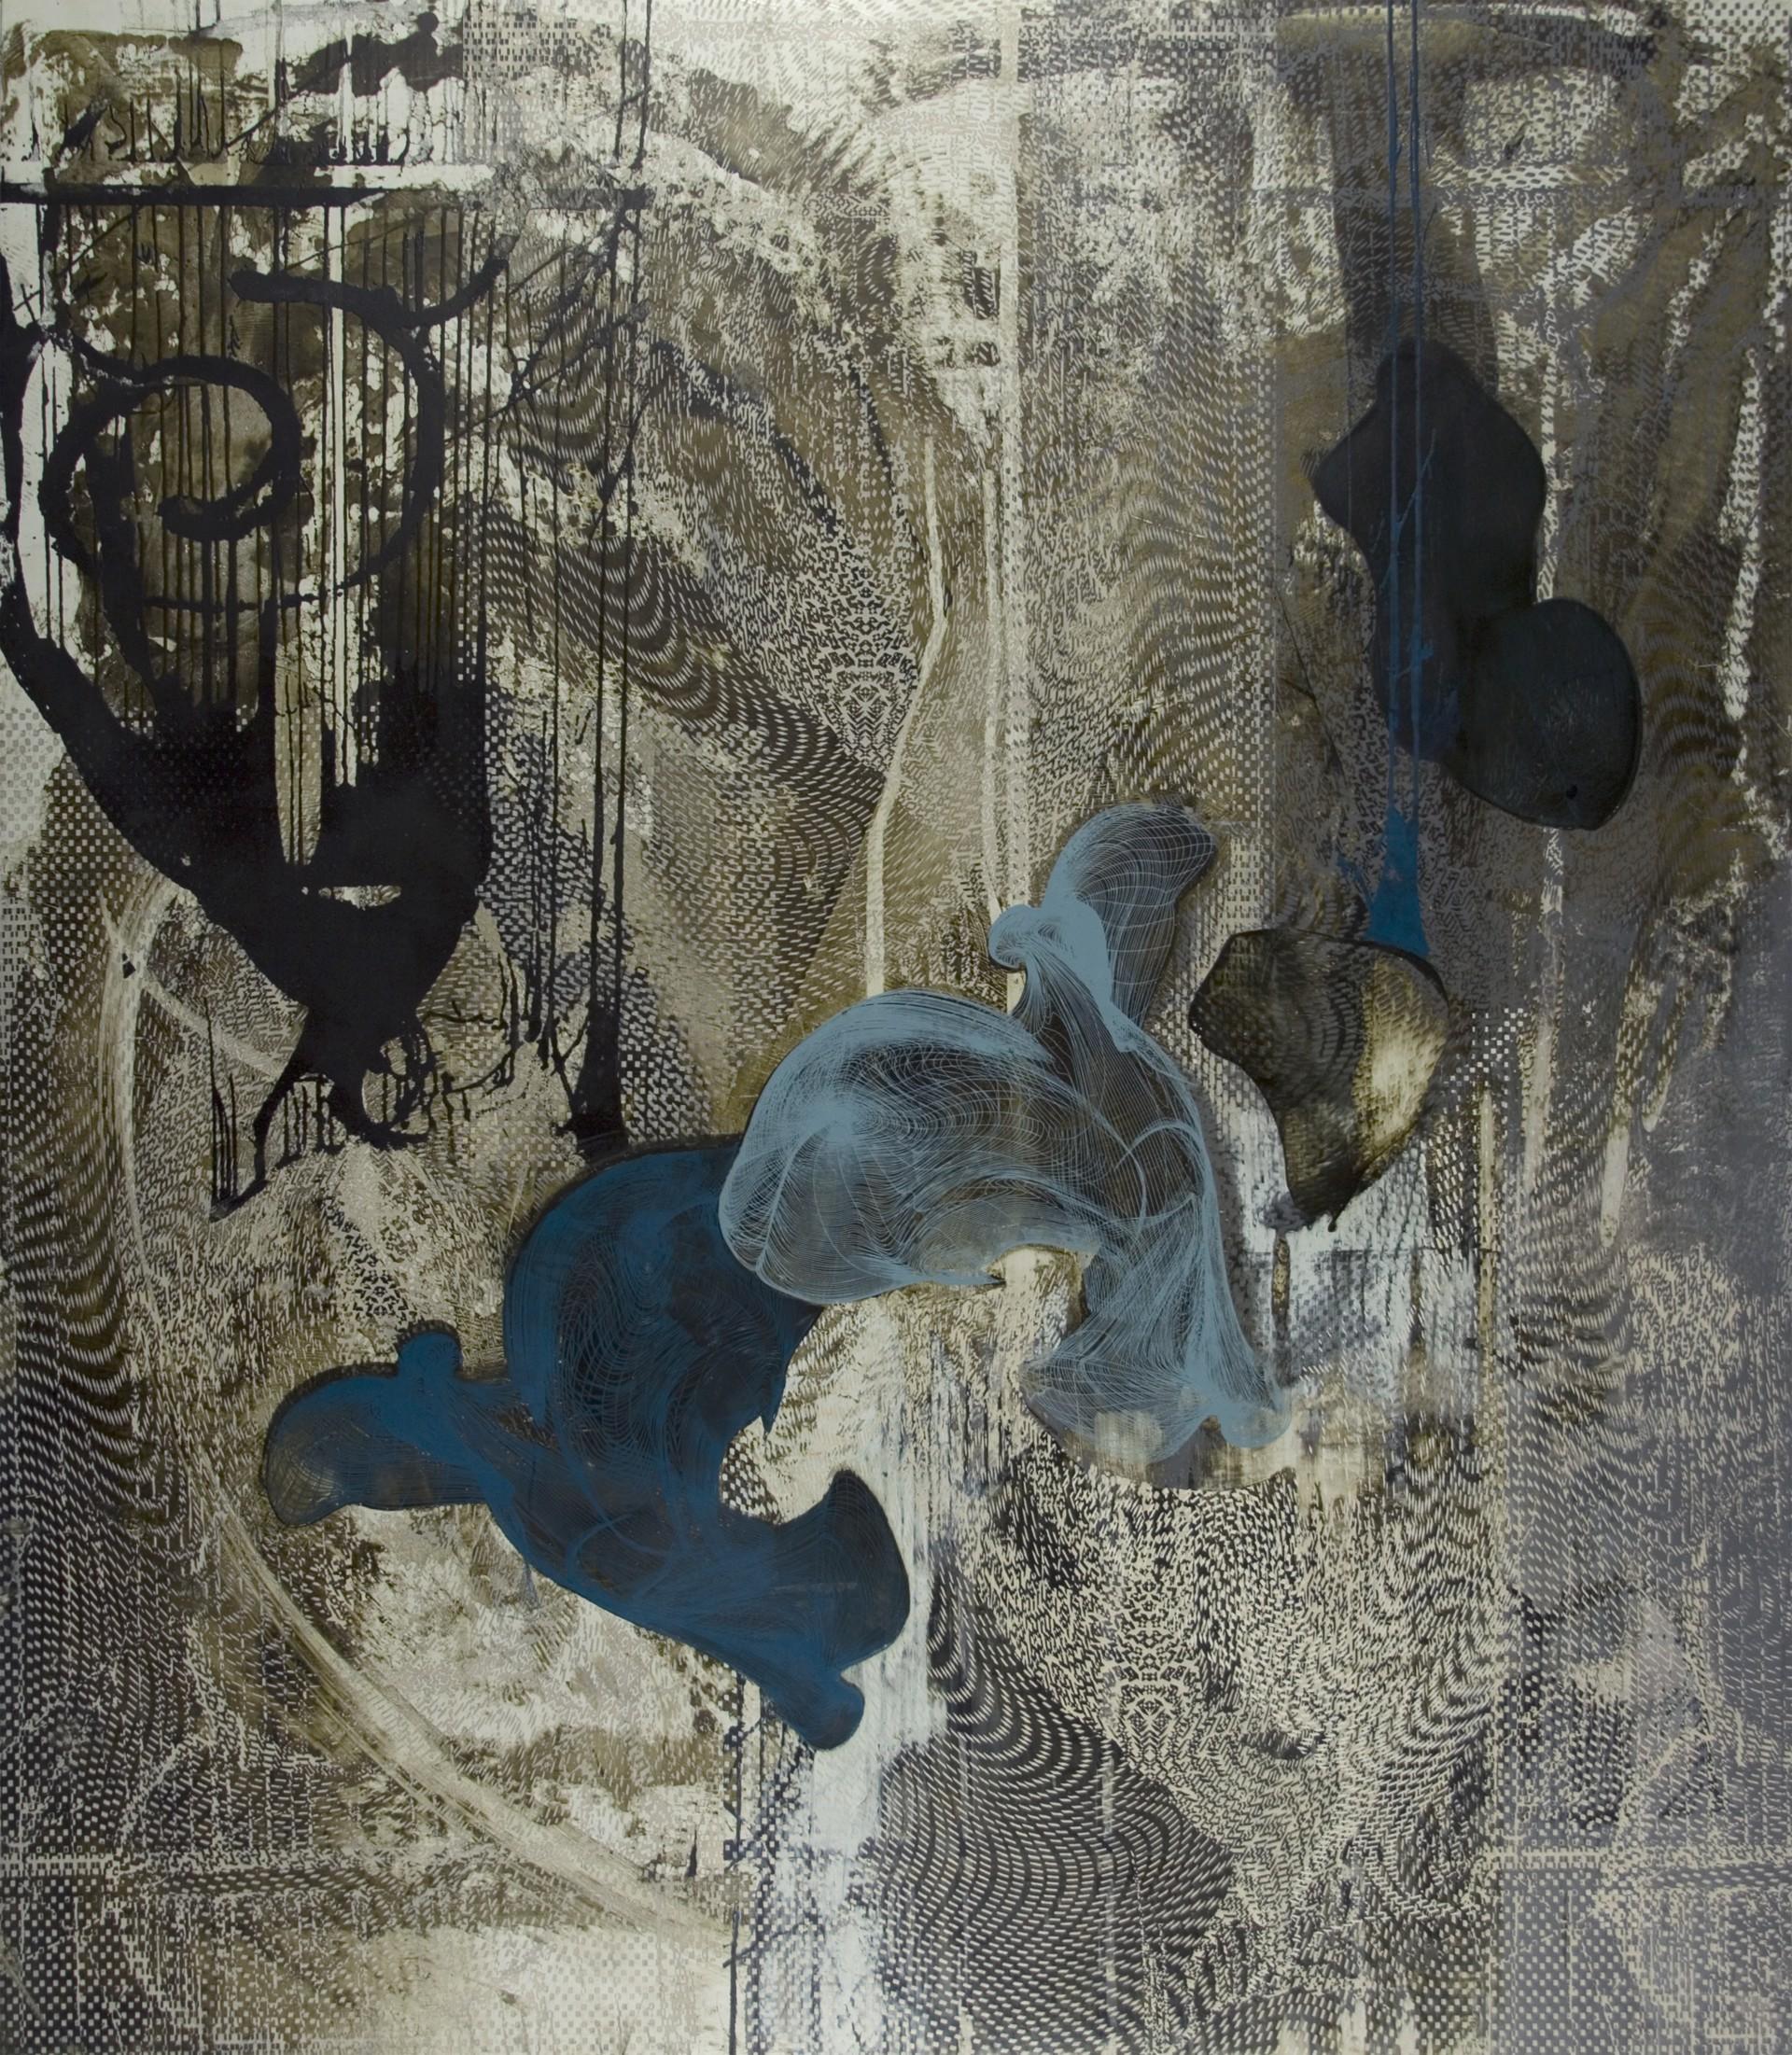 Untitled 1414 by Dorothea Van Camp